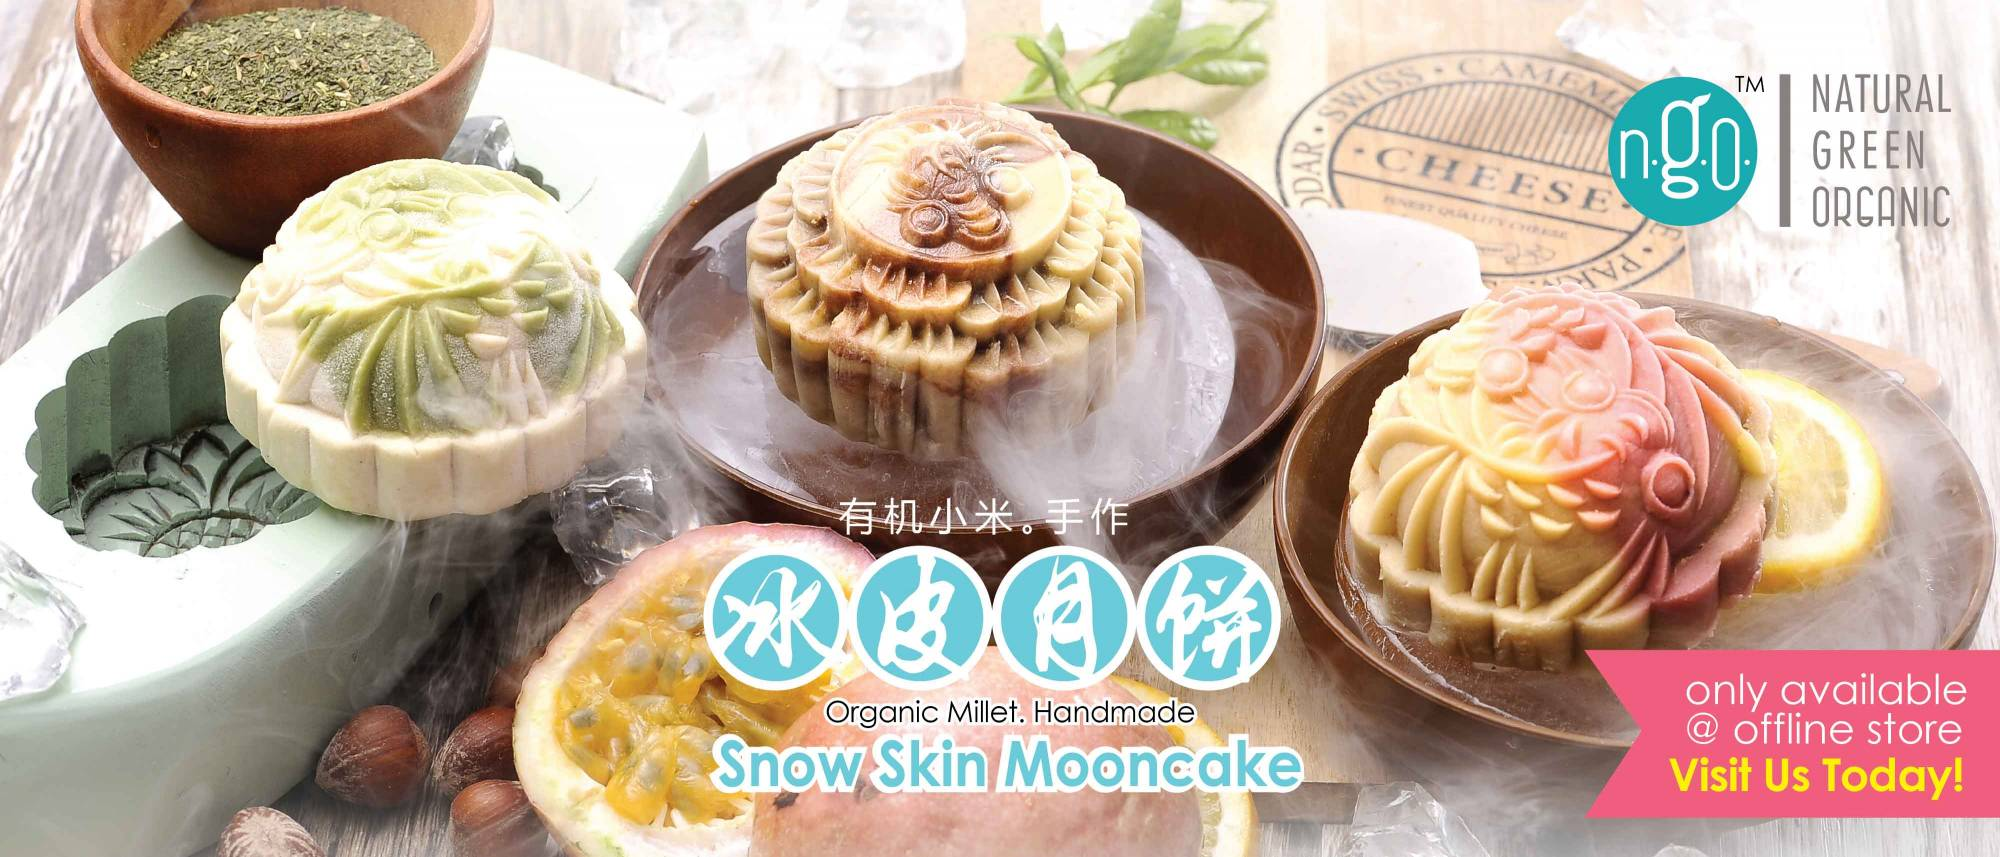 Mooncake Snow Skin 2020